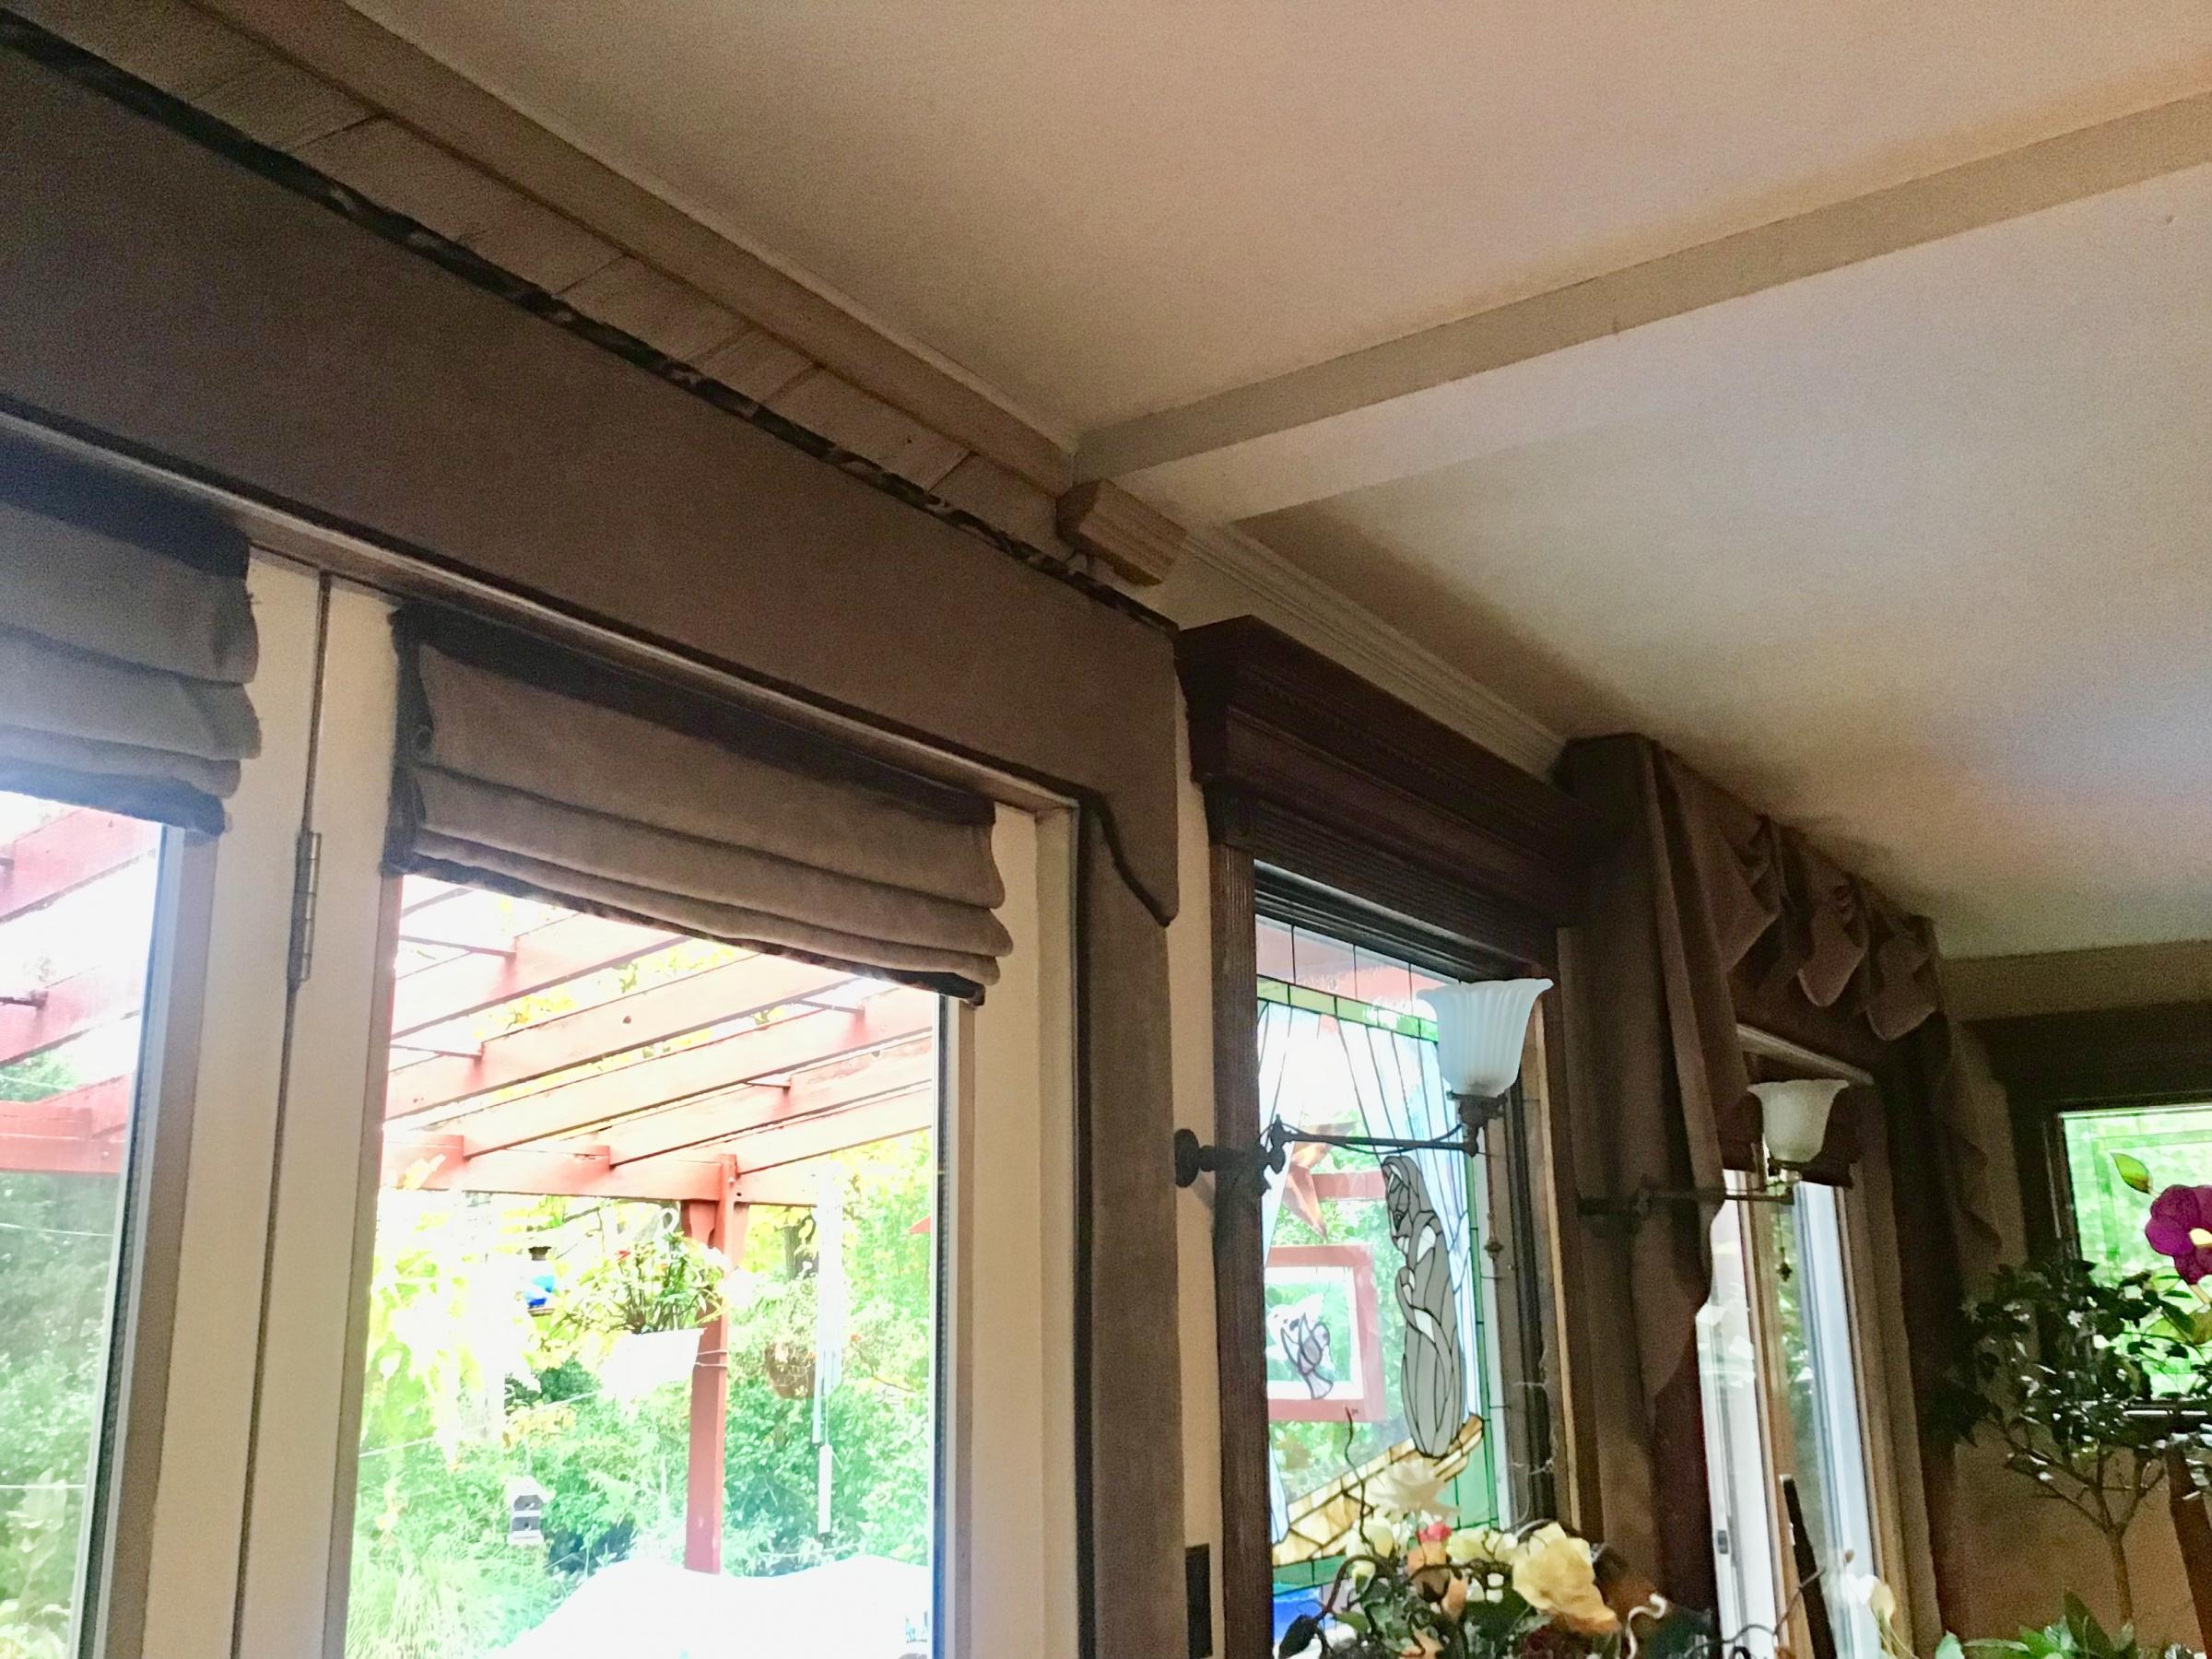 Curtain ideas for these old wood headers ?-4c5842e6-9e55-4ec4-928c-23a459fe2e62.jpg